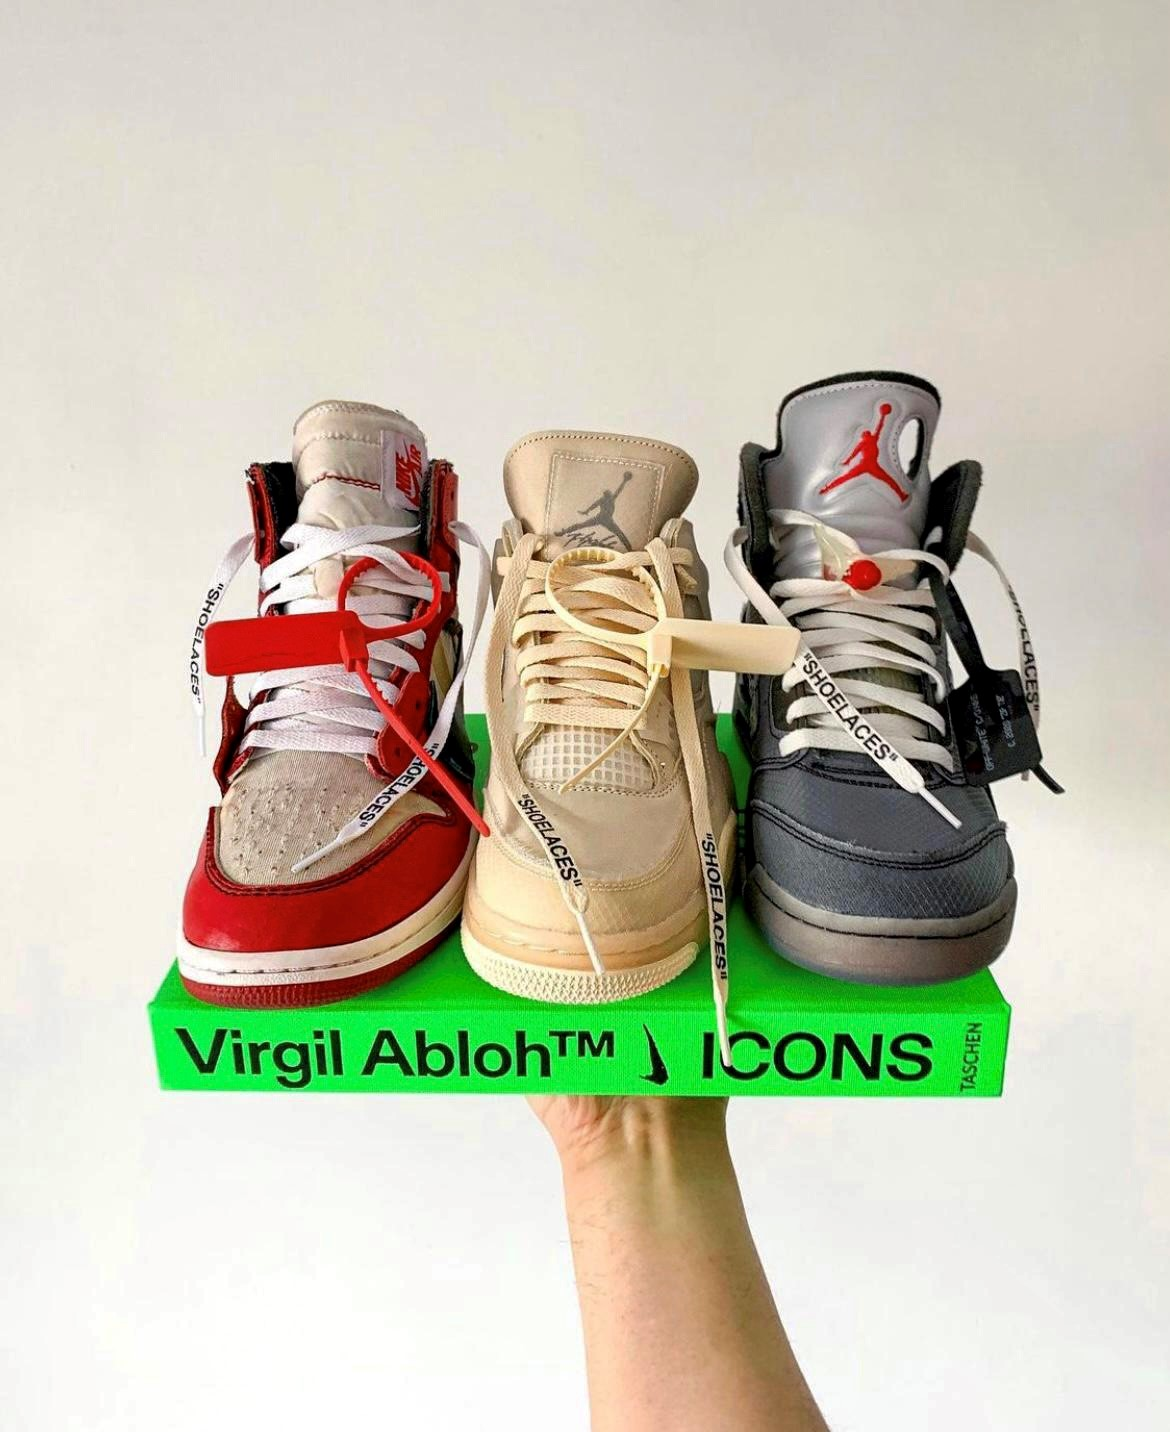 Influential: Carl Kho (instagram: carlkho) showcases sneakers